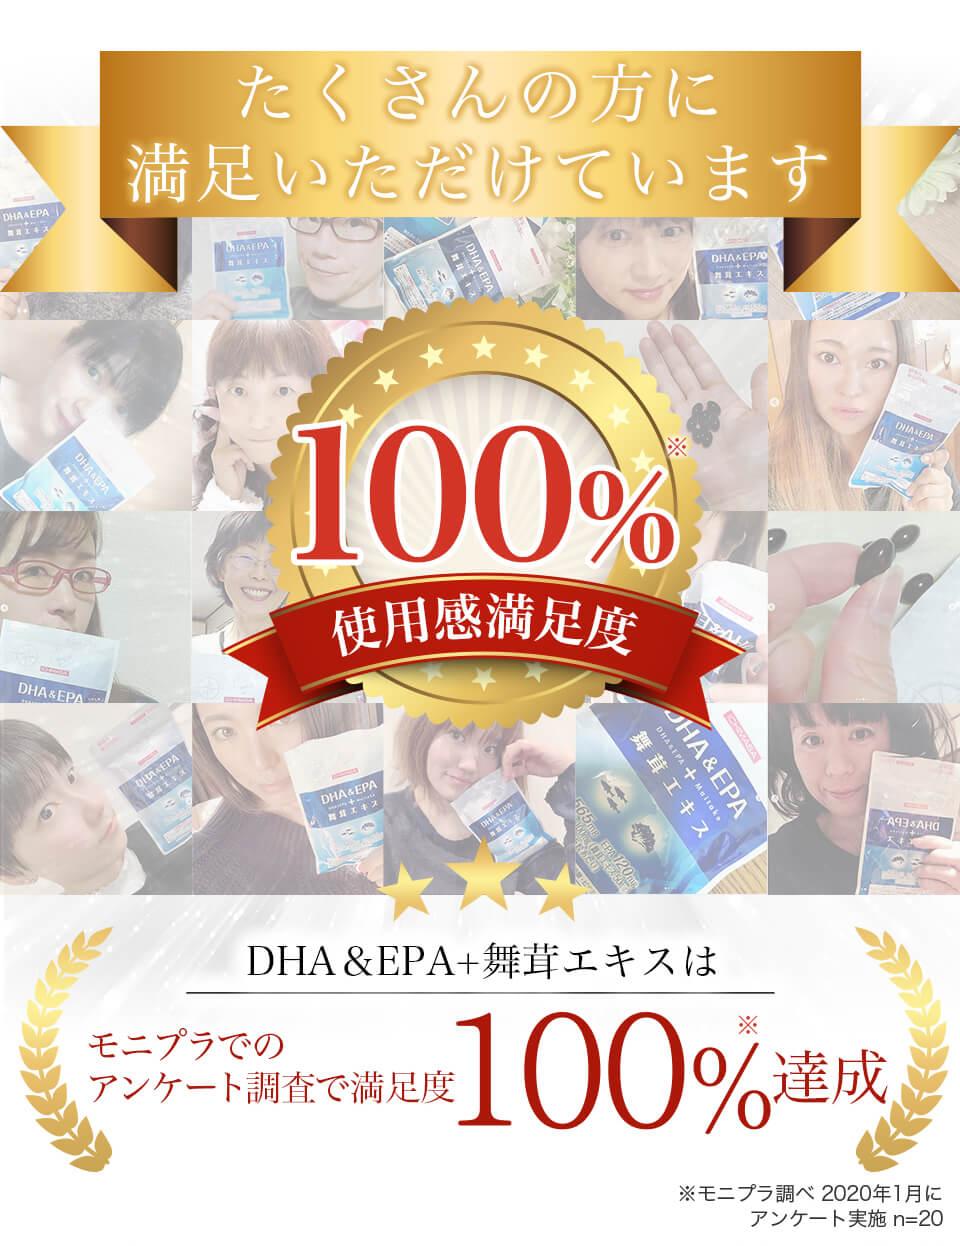 DHA&EPA+舞茸エキス サプリメント n︲3系脂肪酸 ビタミンE 使用感満足度100%